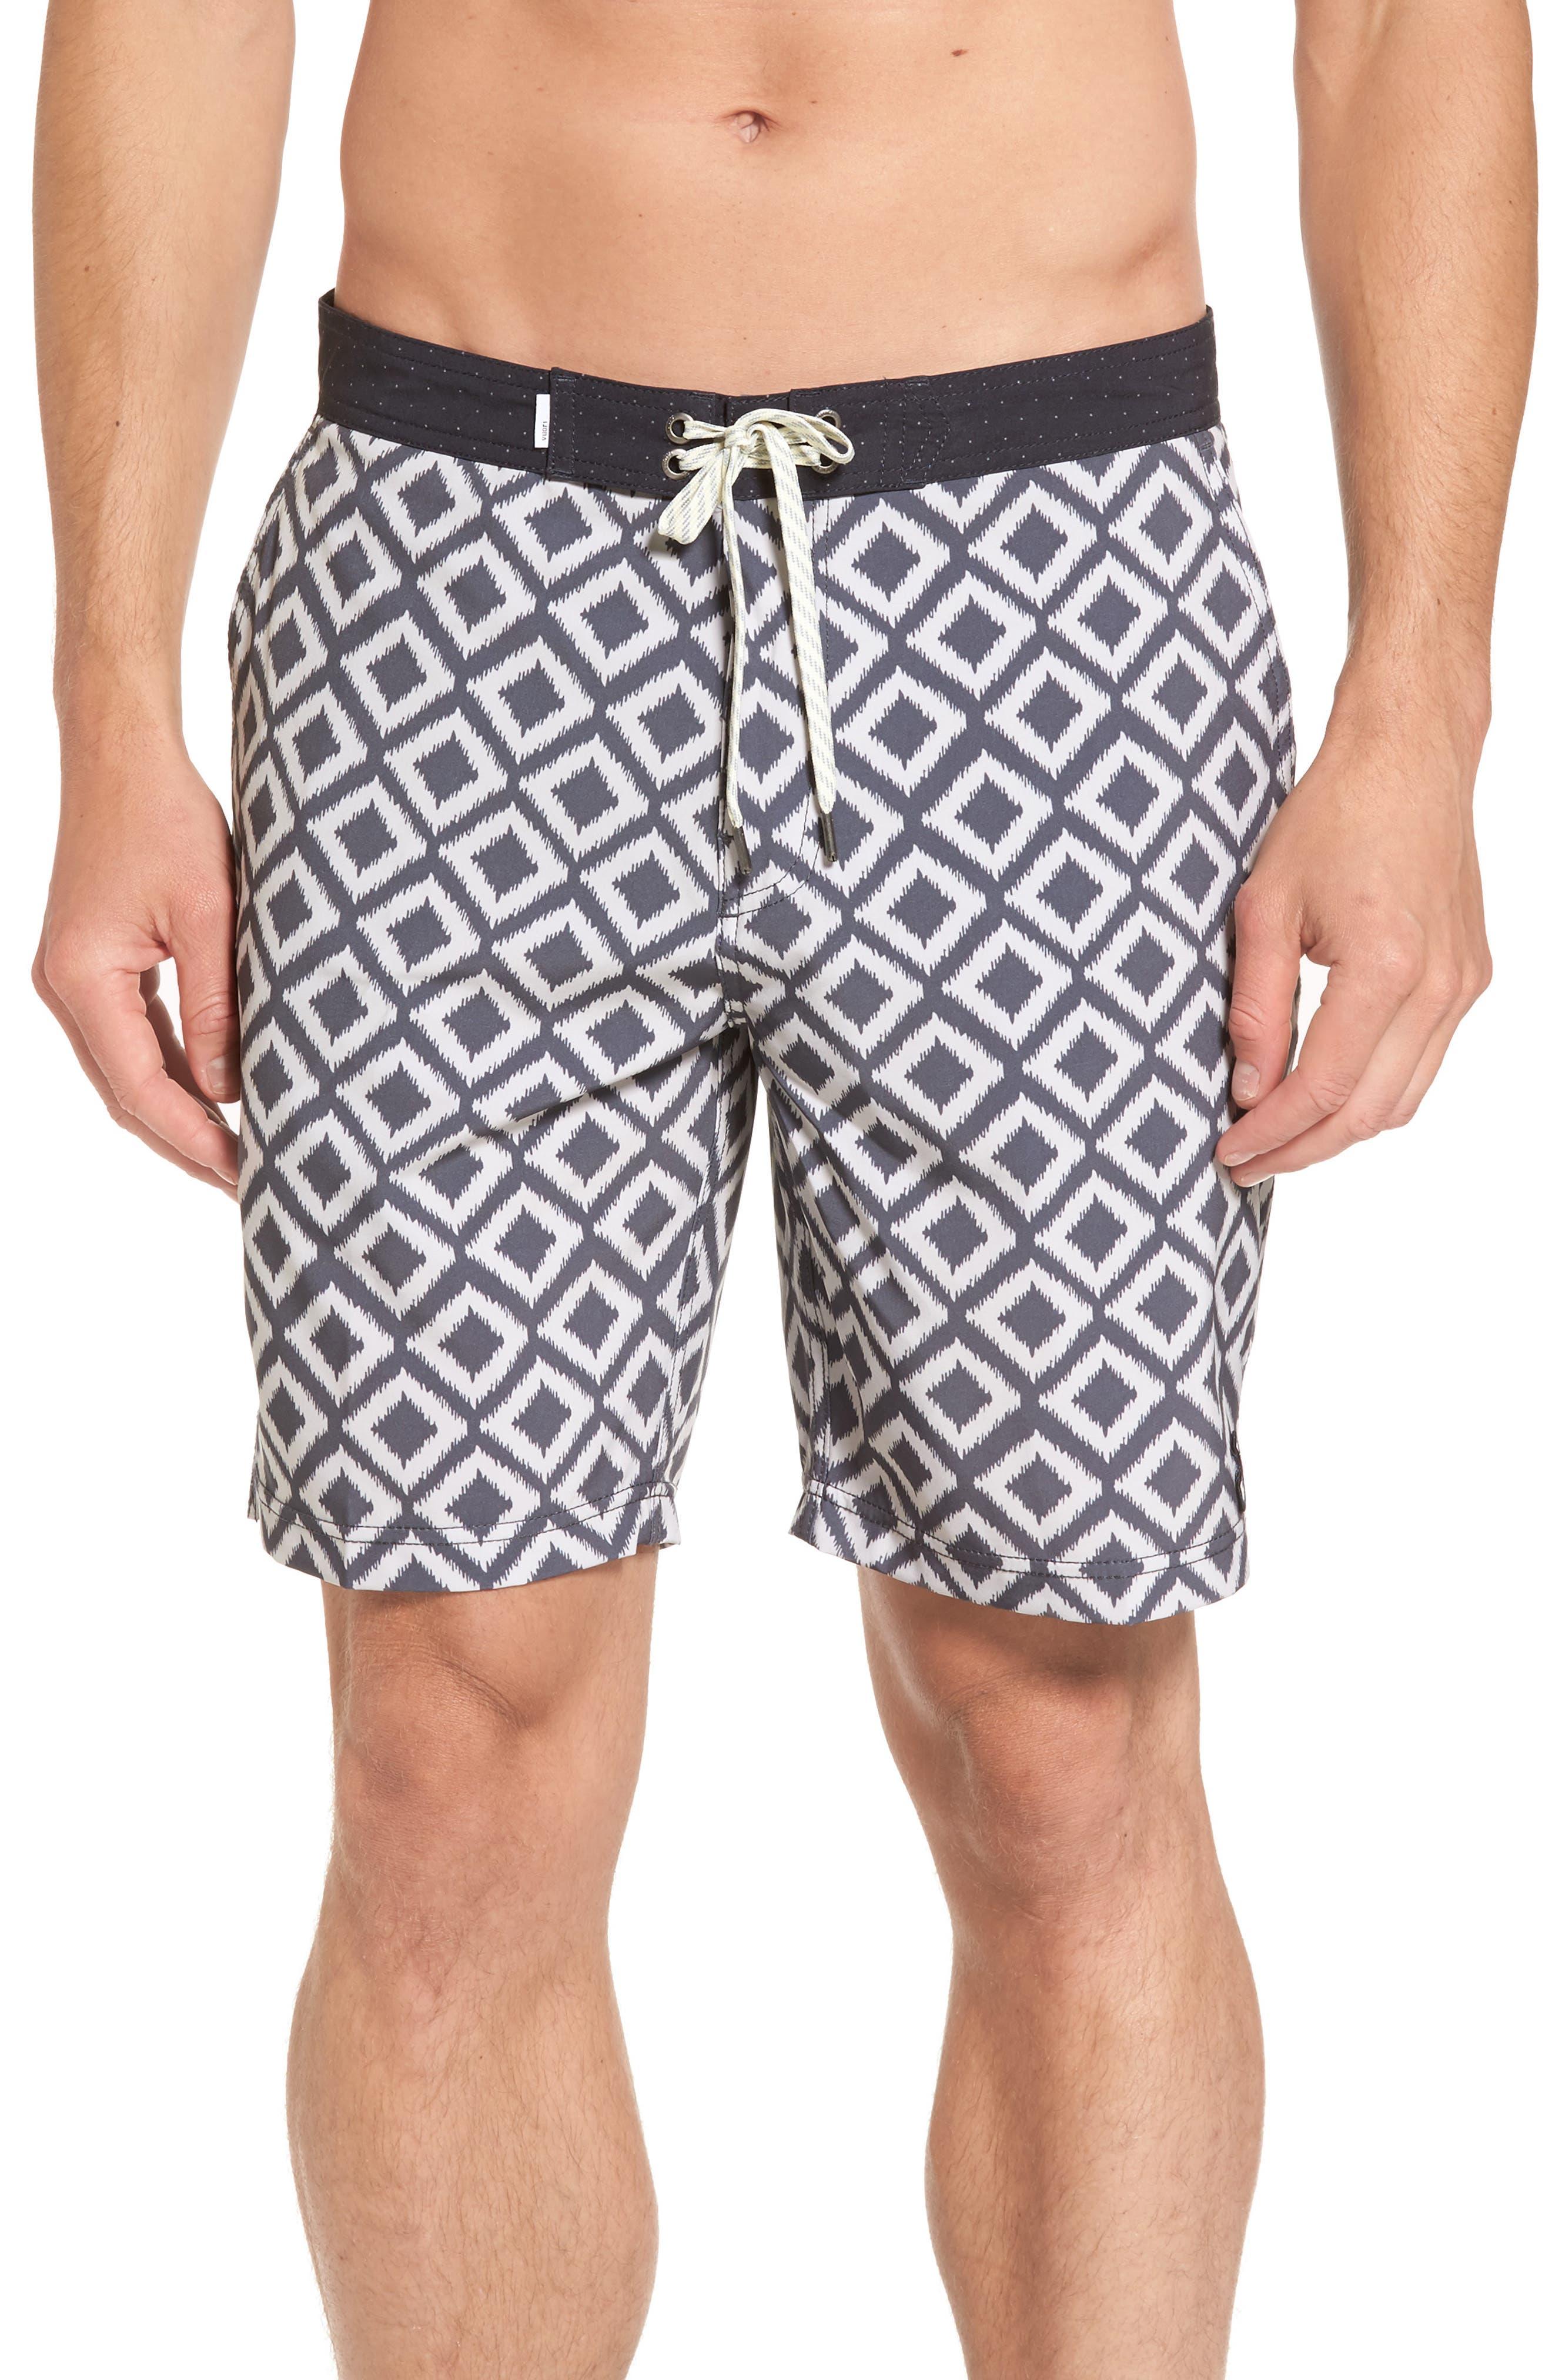 Equator Board Shorts,                         Main,                         color, 250